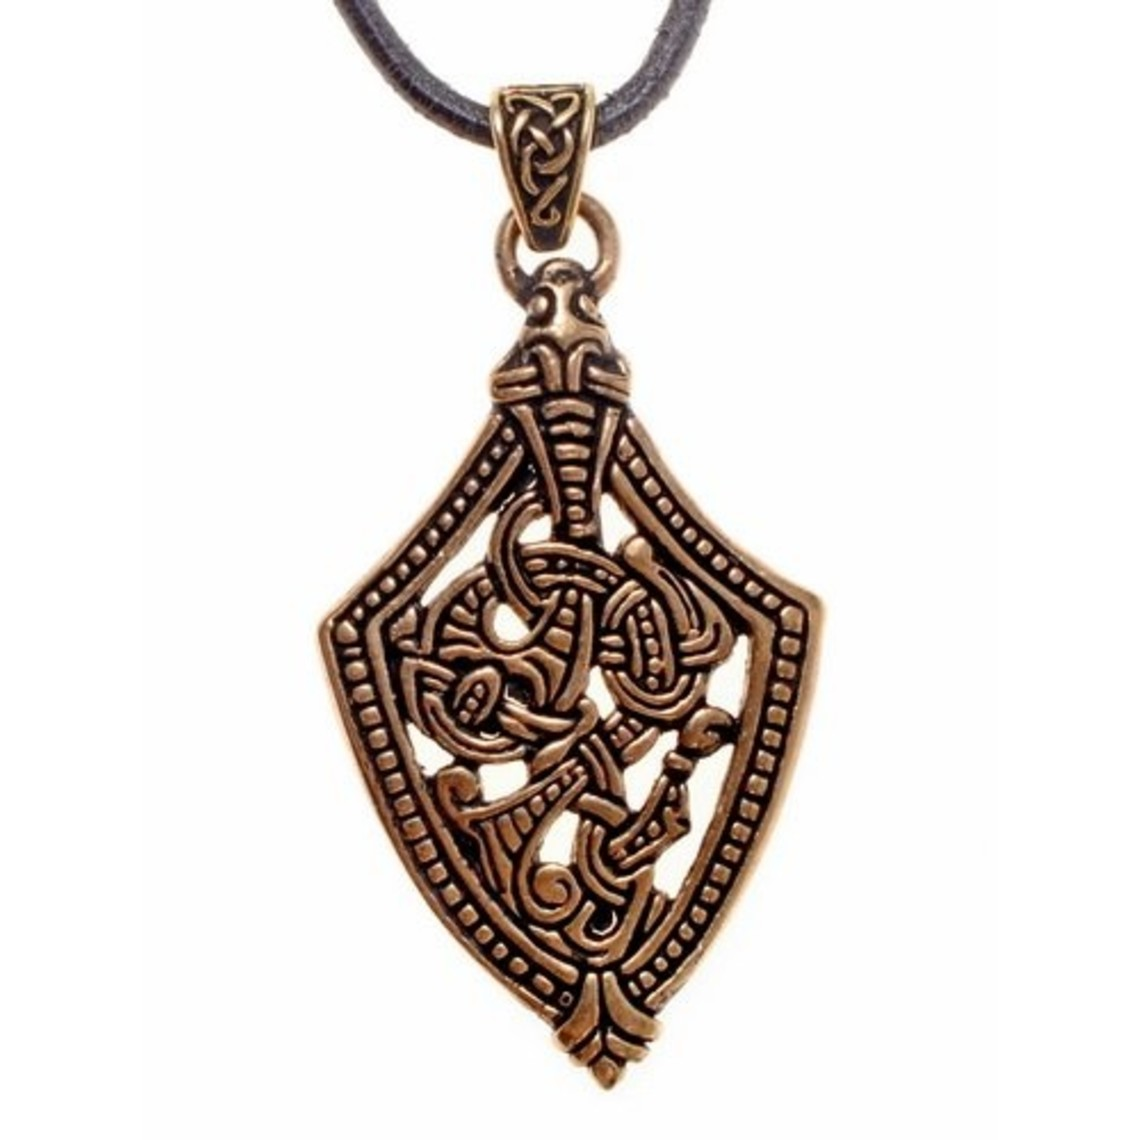 Borre style sword chape jewel, bronze